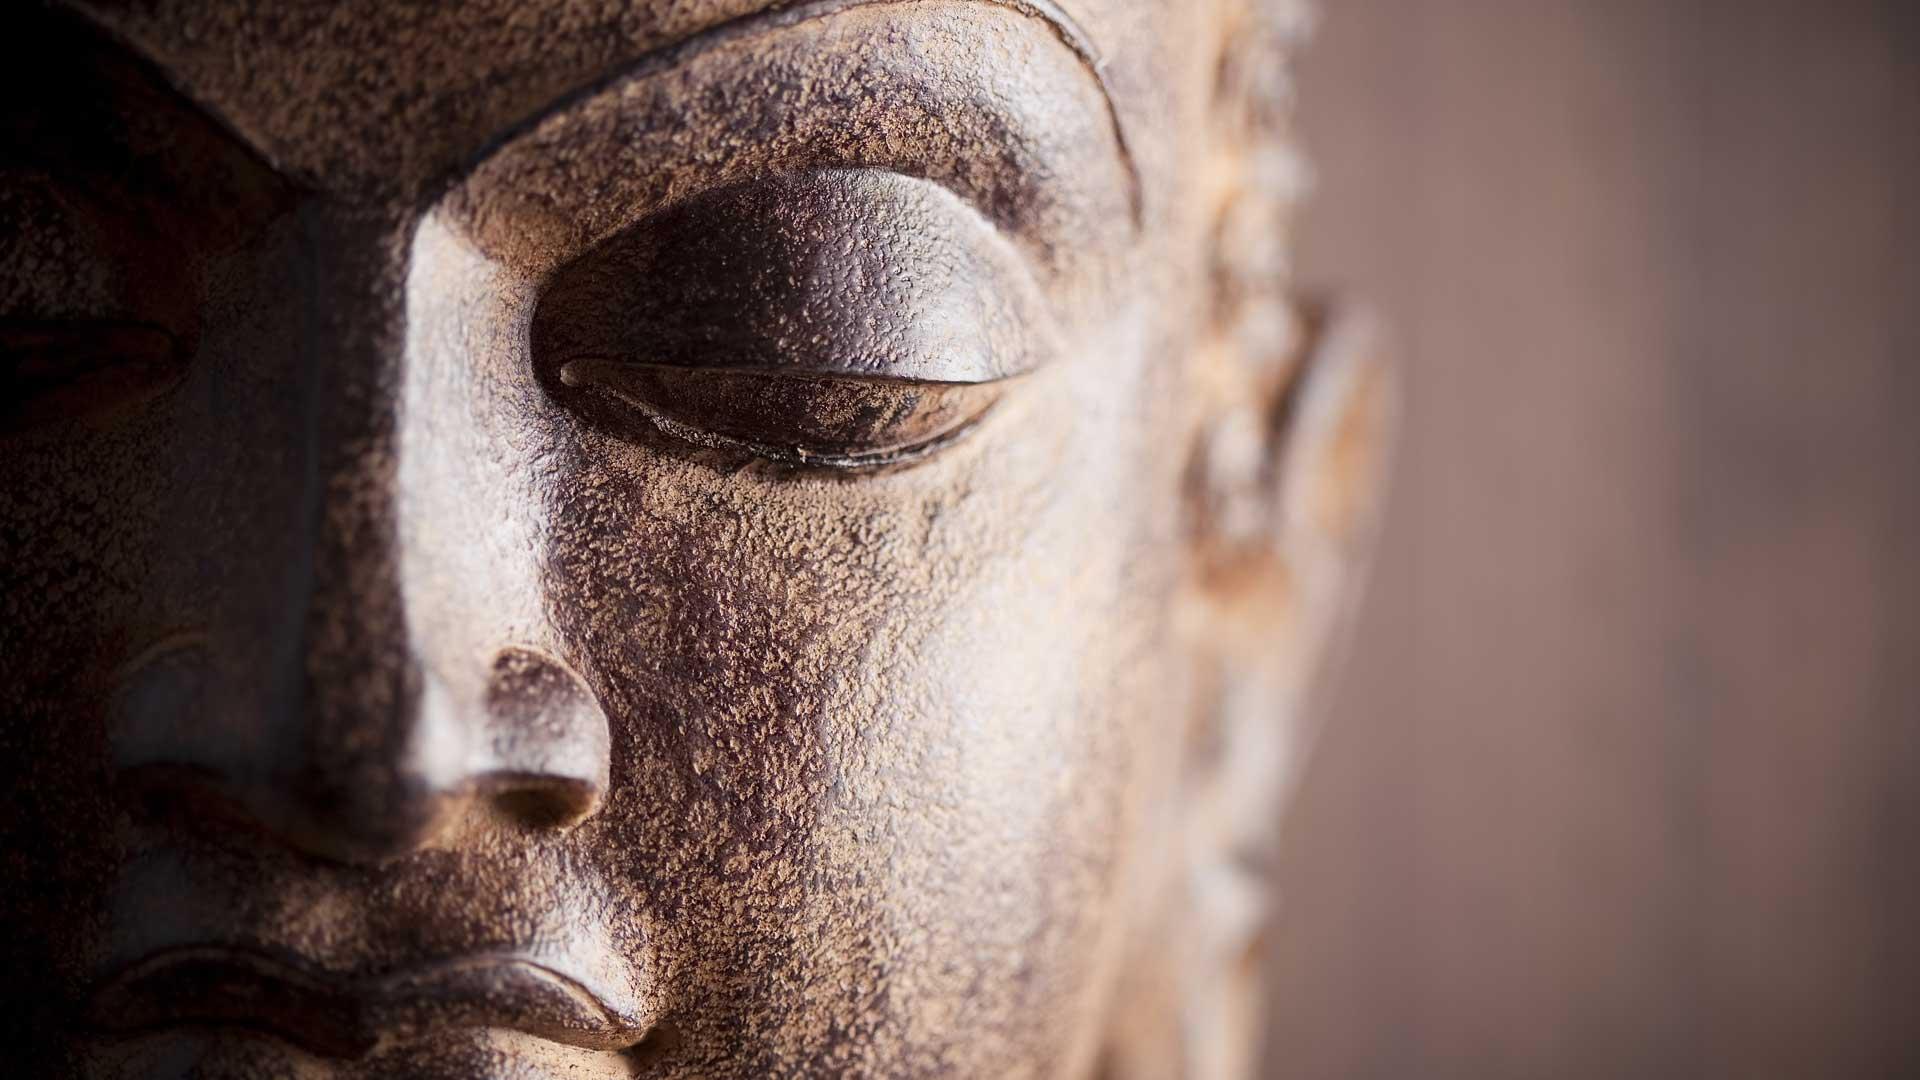 Hem Seyahat Hem İnziva, Japonya'da Zen Budizmi'ni Deneyimleyin